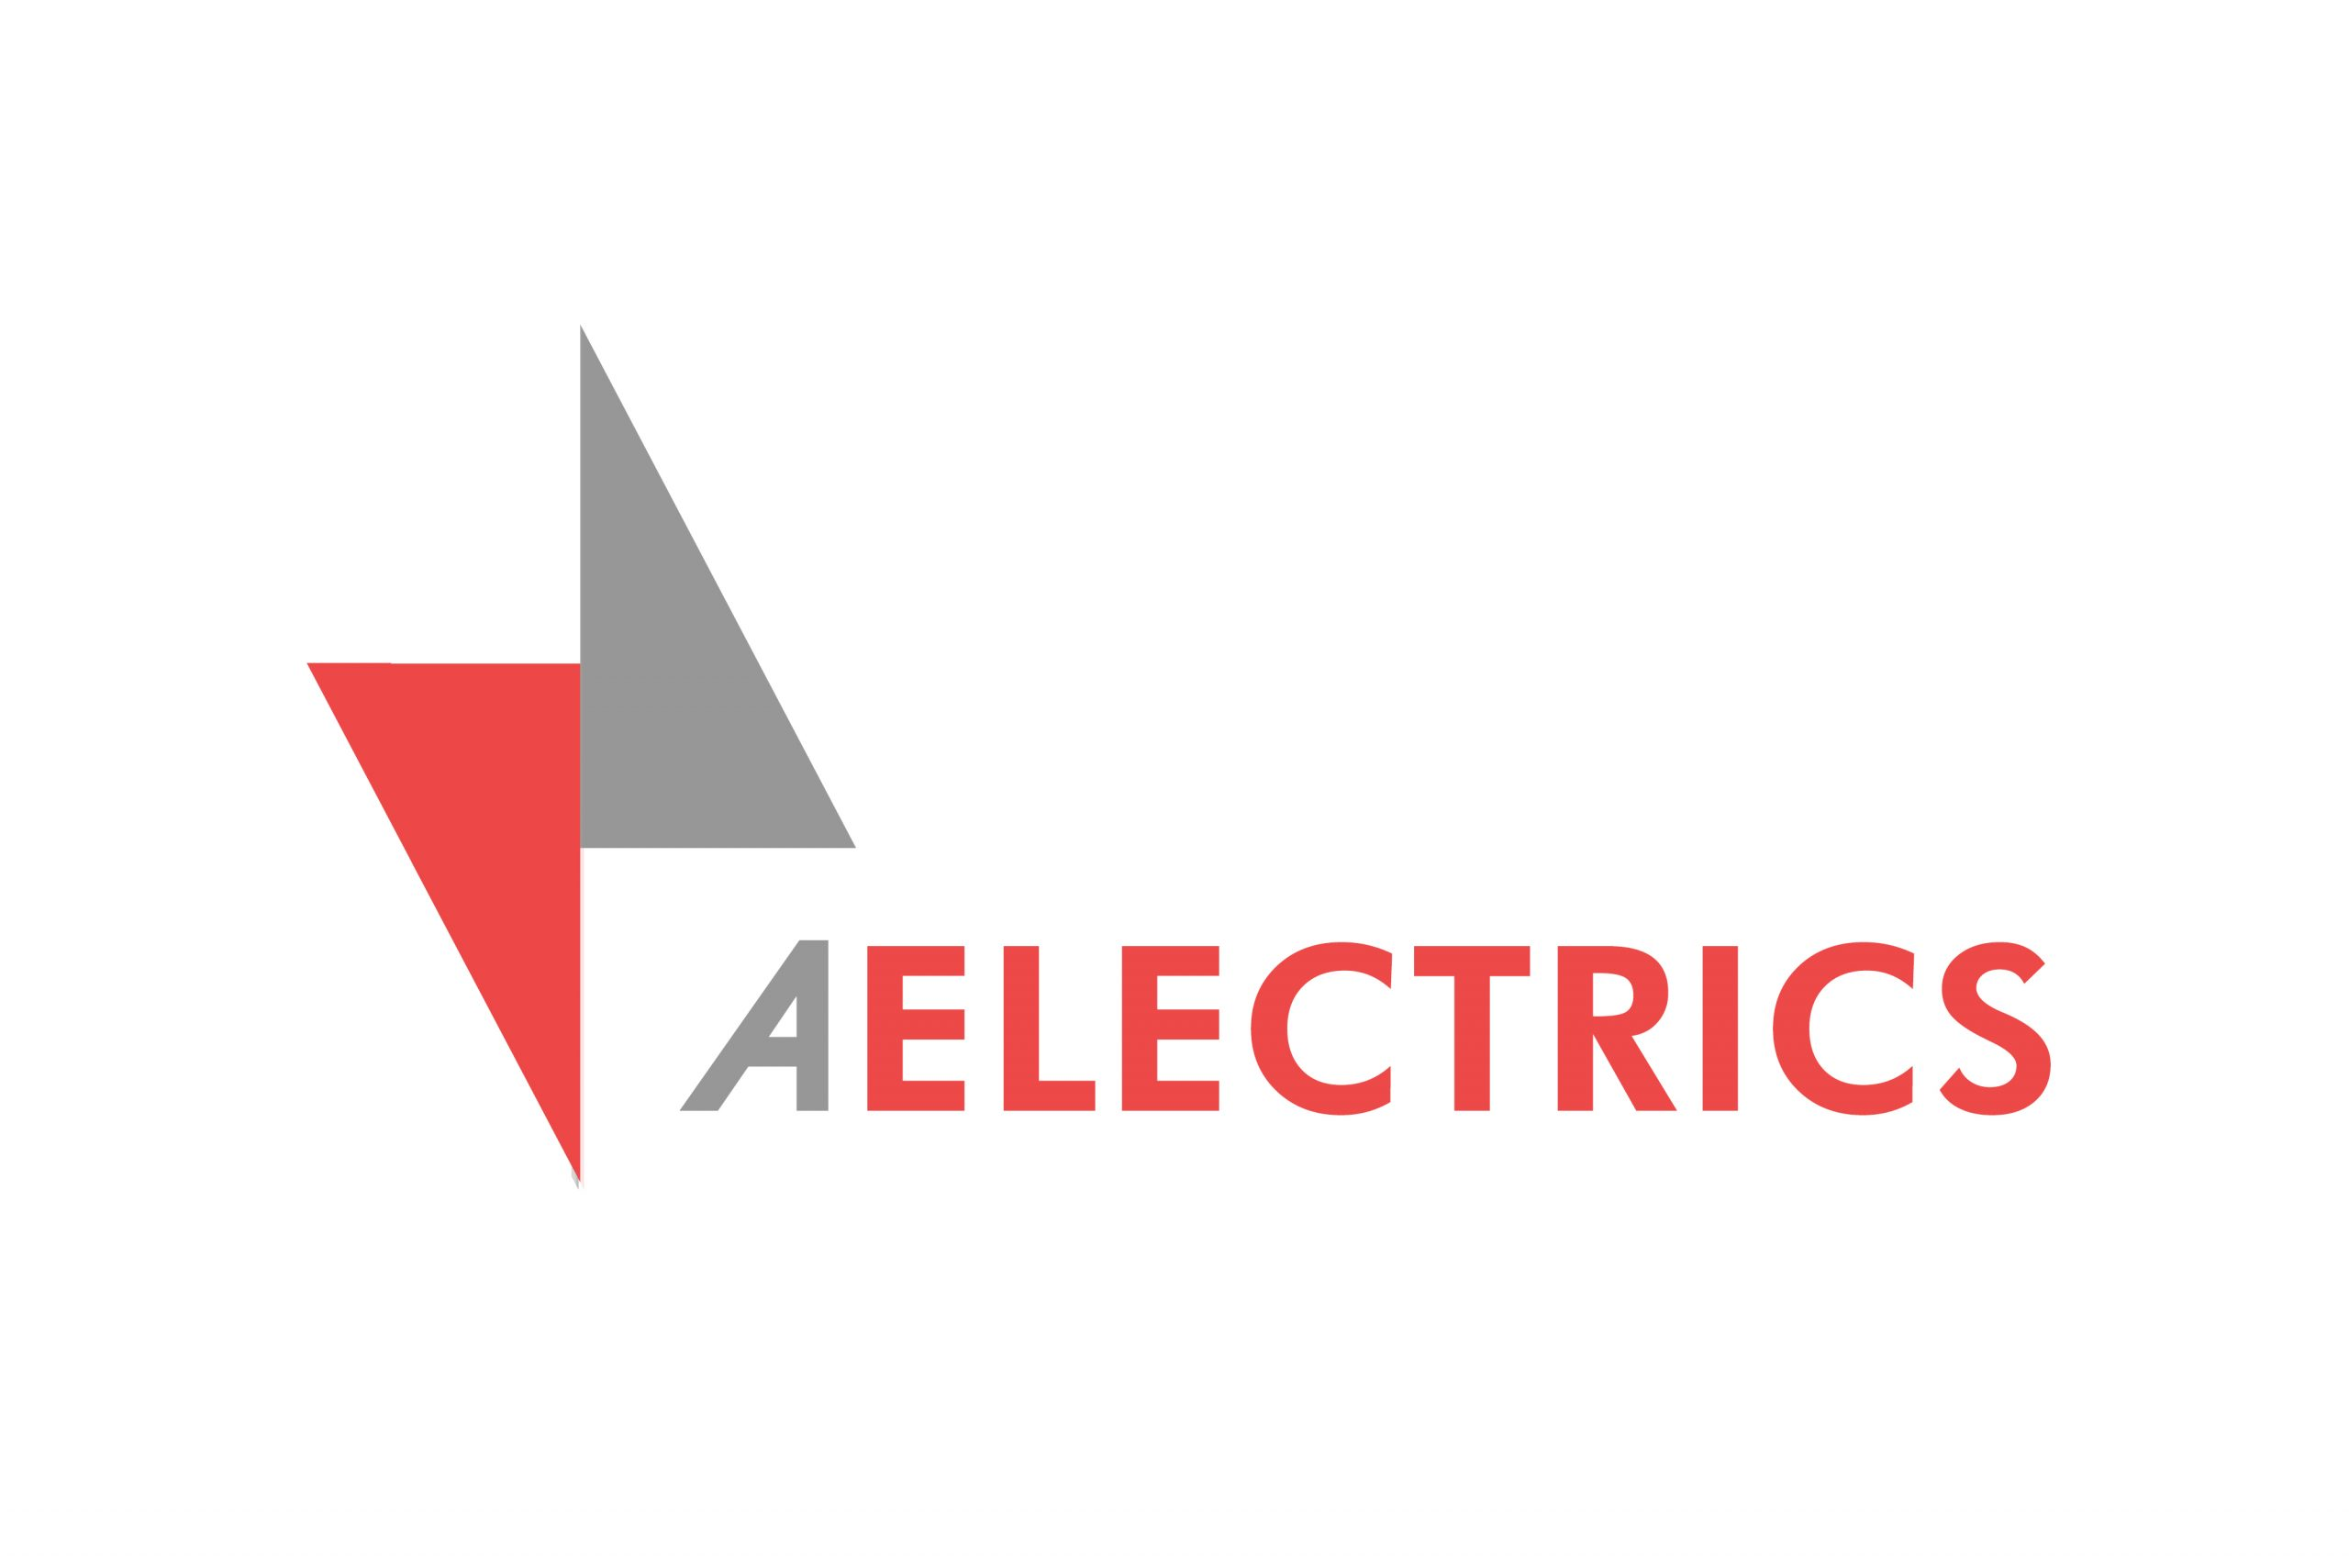 APS Aelectrics